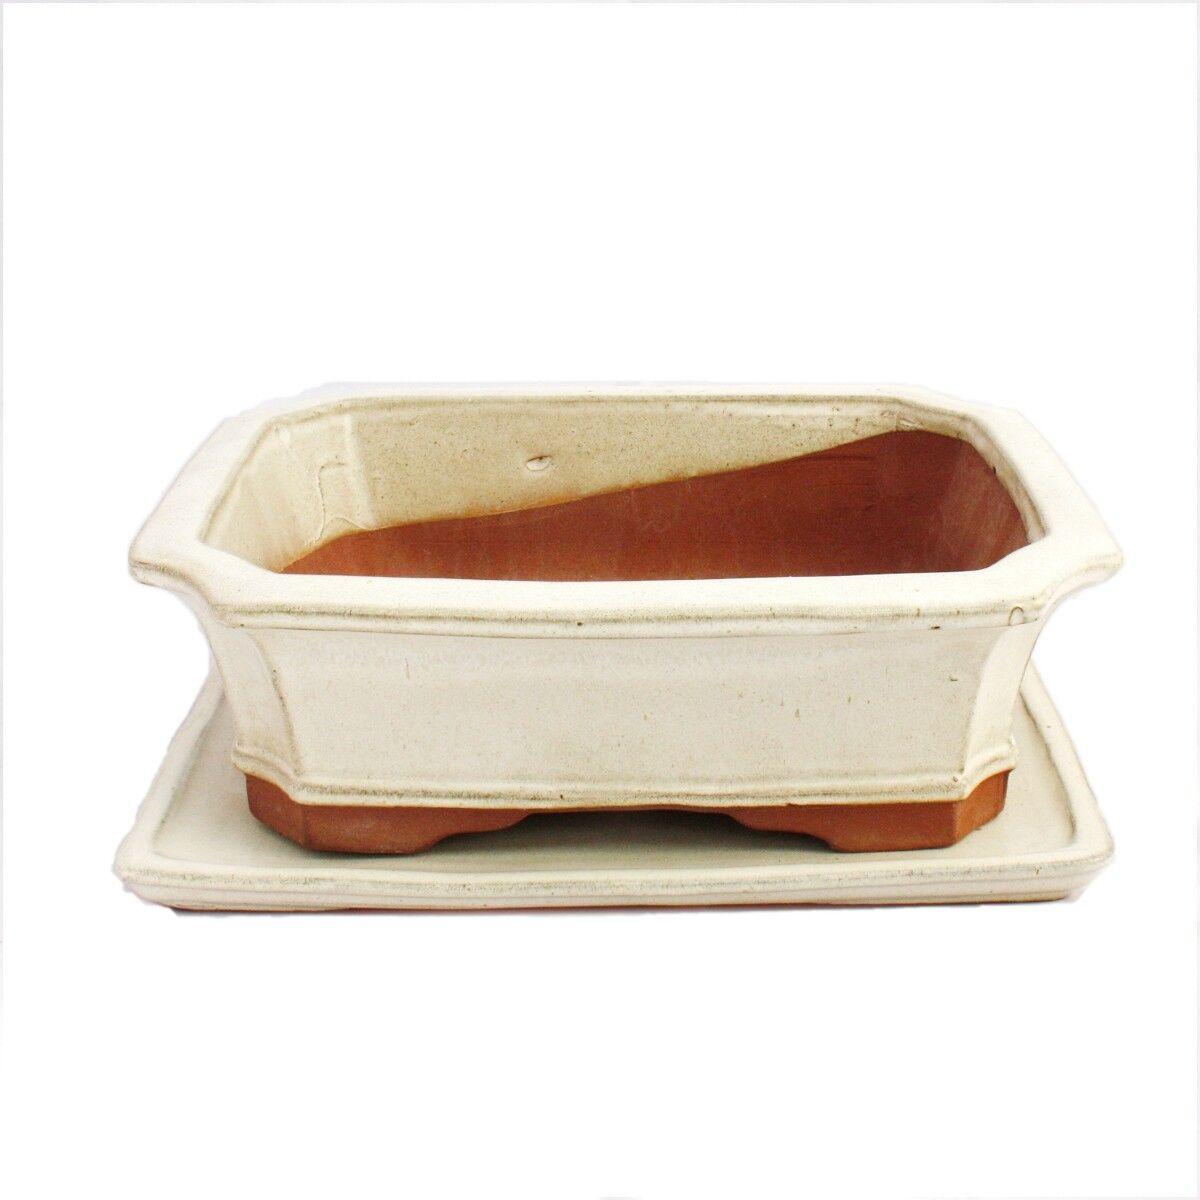 Bonsai-cásCochea con bajo platos talla 5-Color beige claro-cuadrada-modelo g4-l 31cm-B